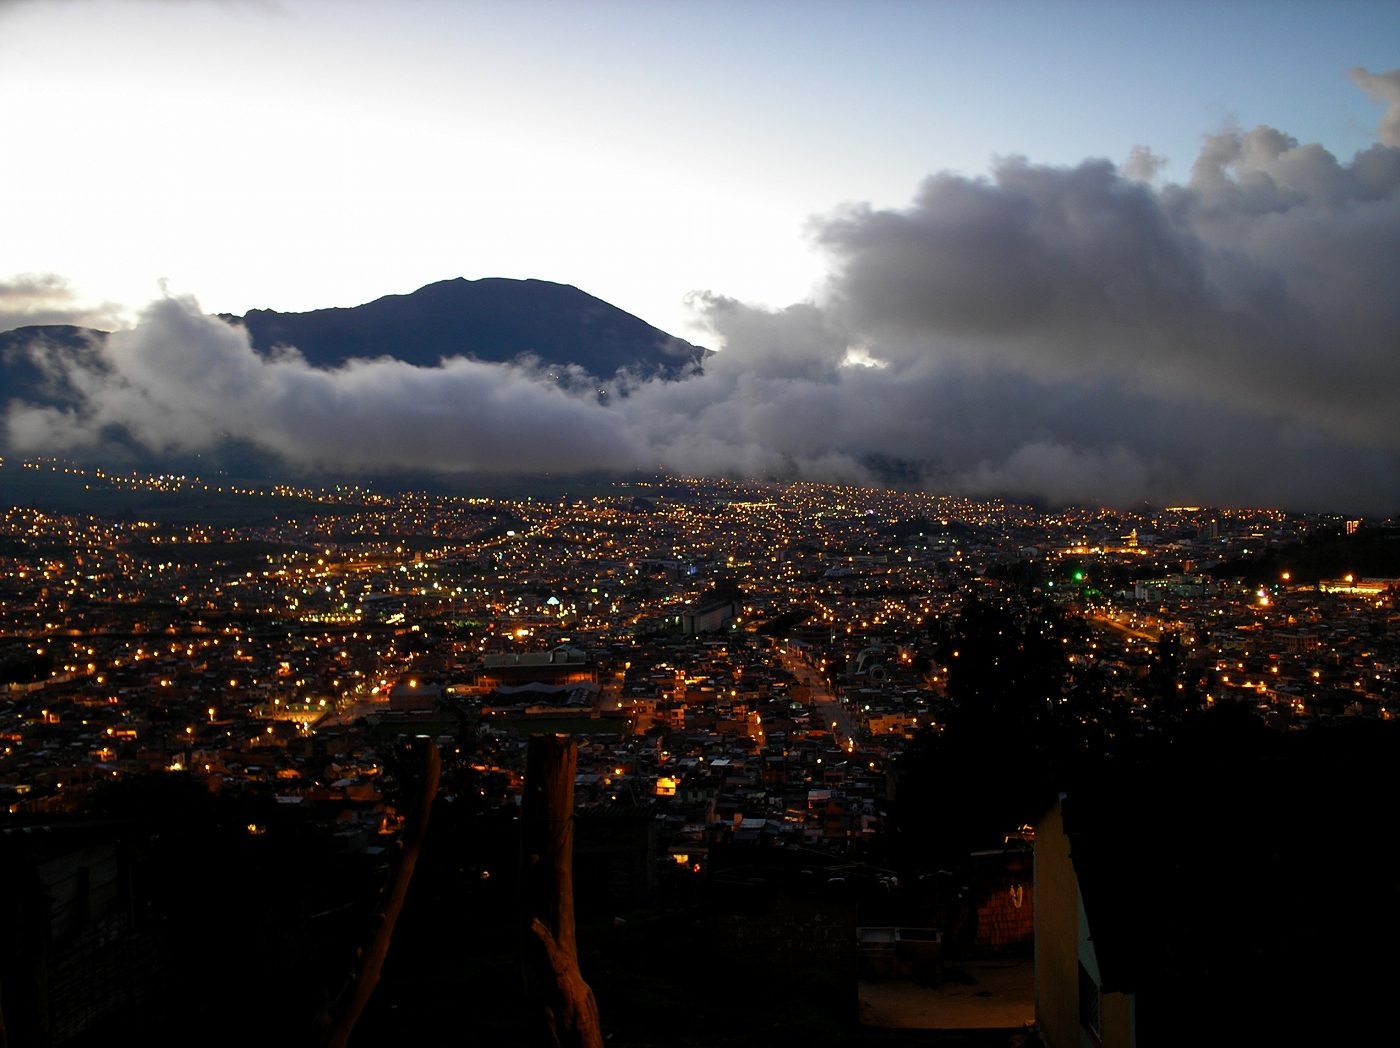 http://upload.wikimedia.org/wikipedia/commons/8/83/San_Juan_de_Pasto_de_noche.jpg